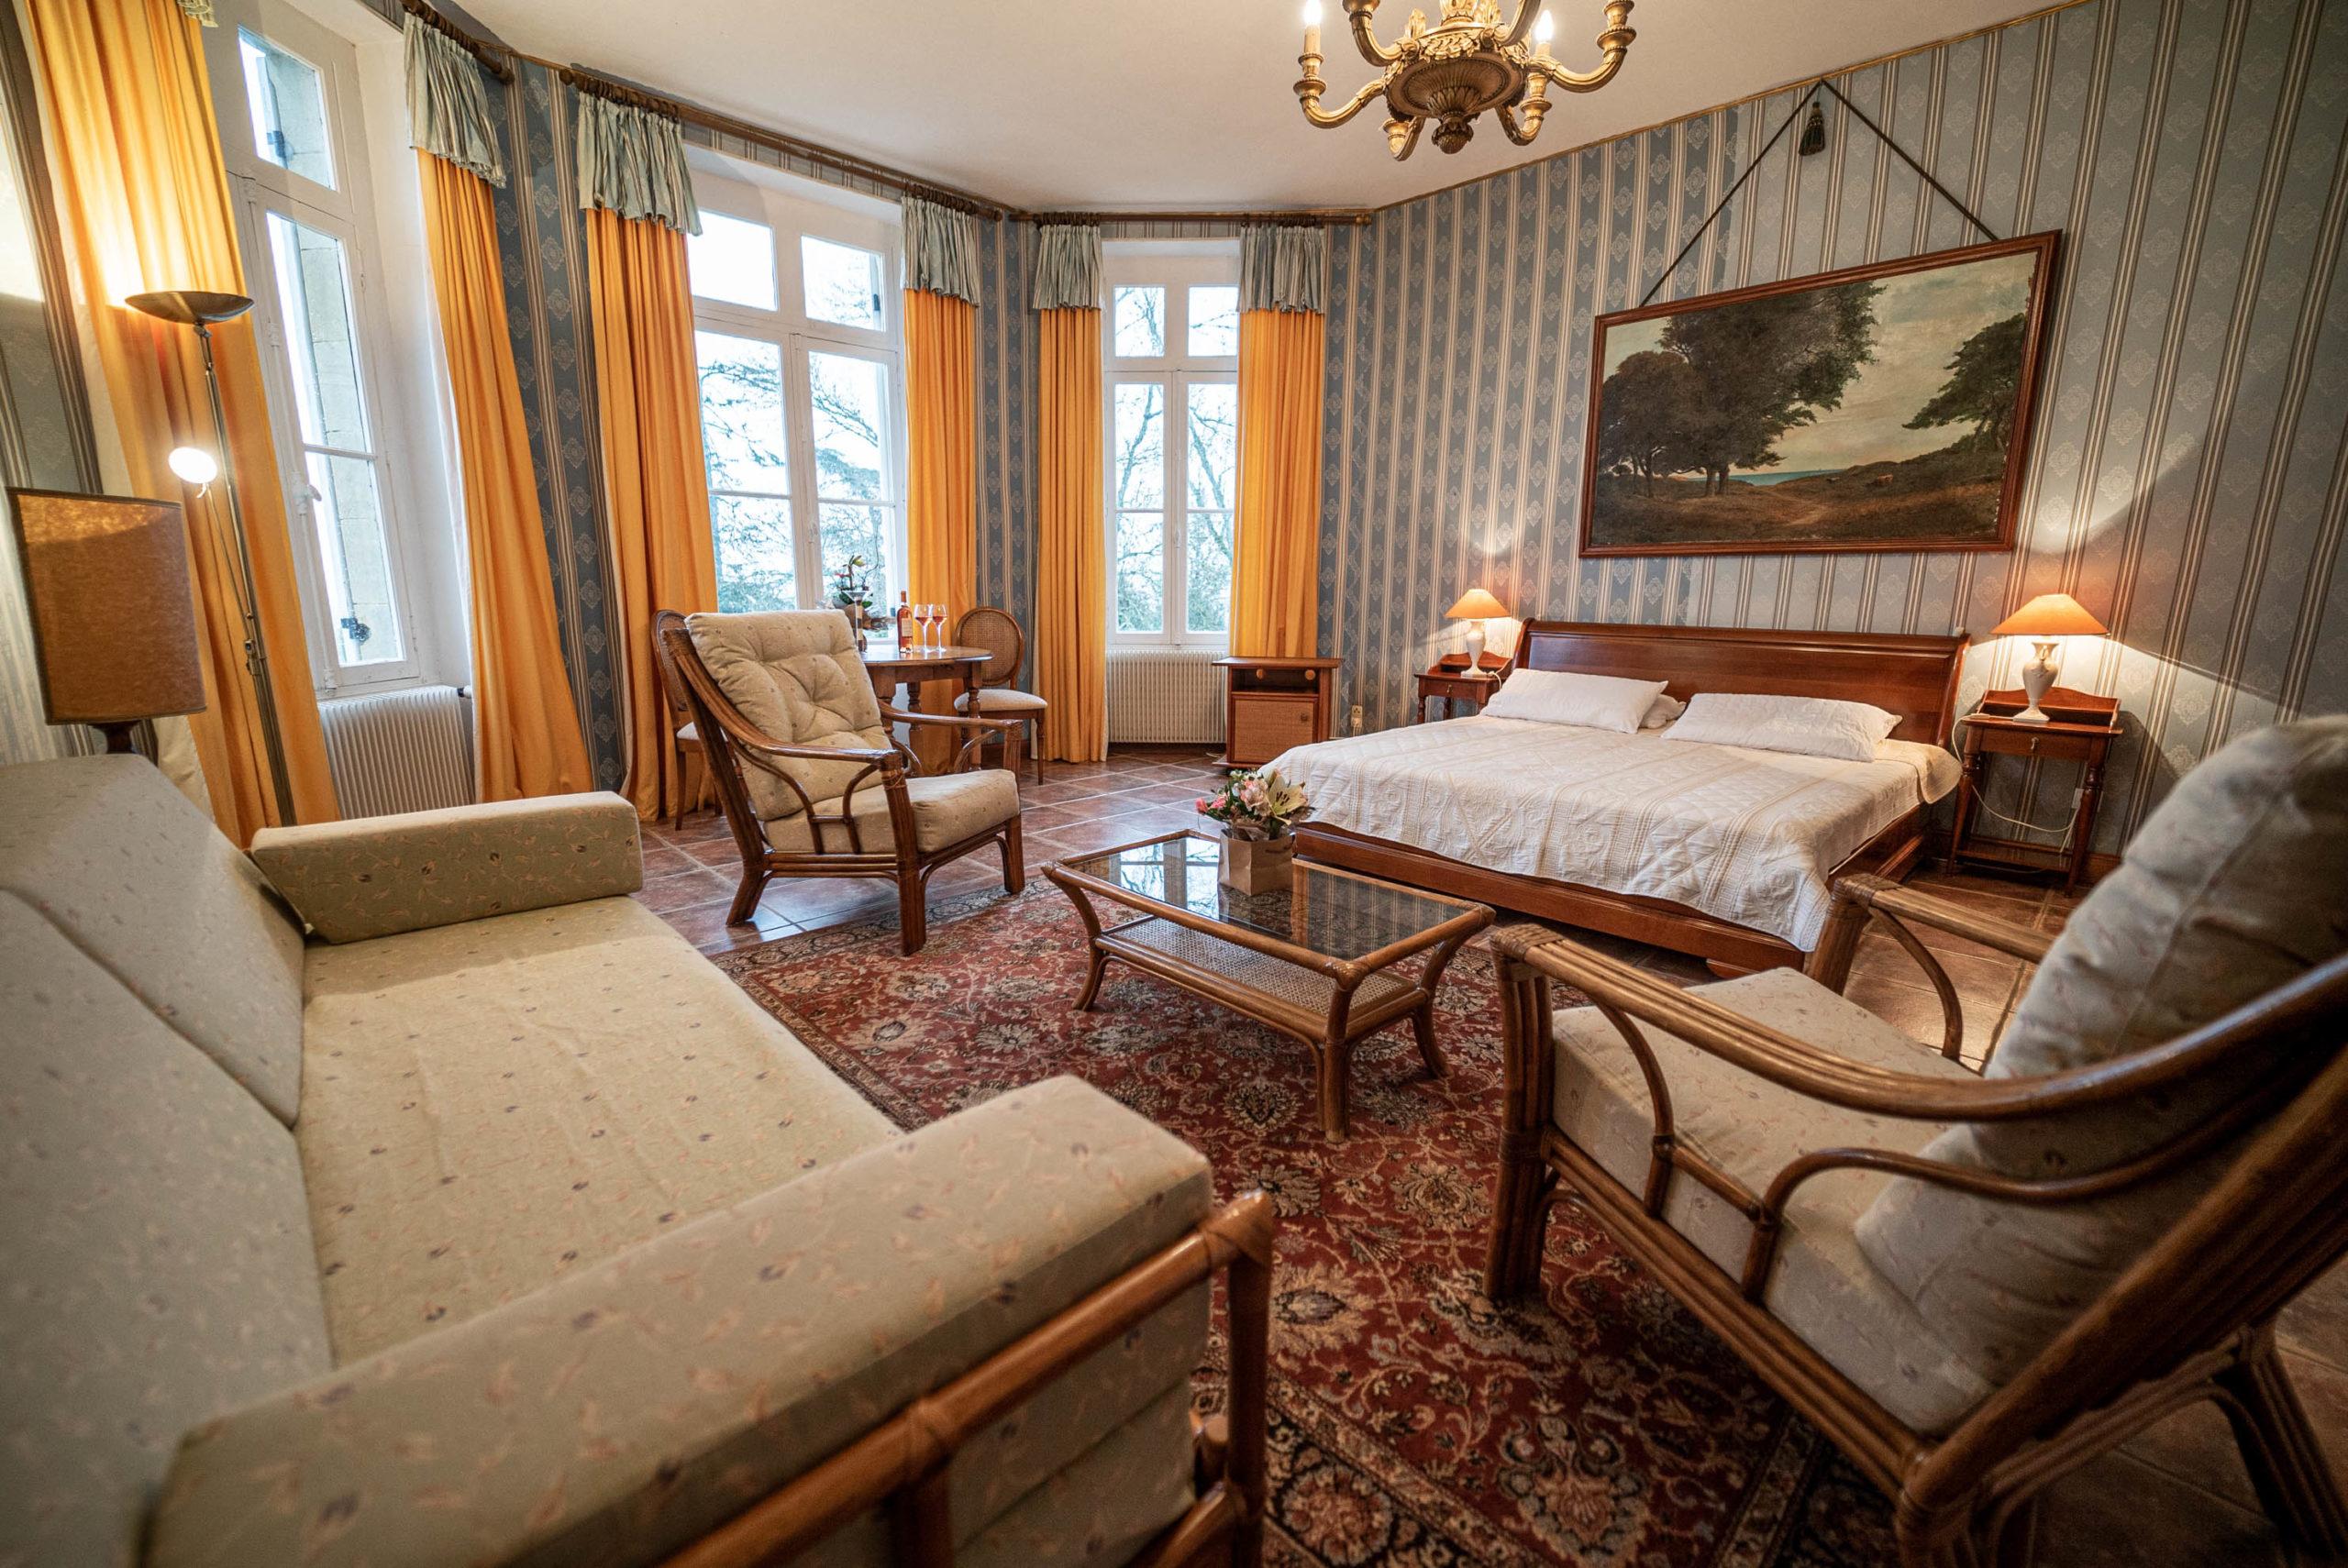 Suite du marquis chambre chateau Rauly location bergerac Monbazillac